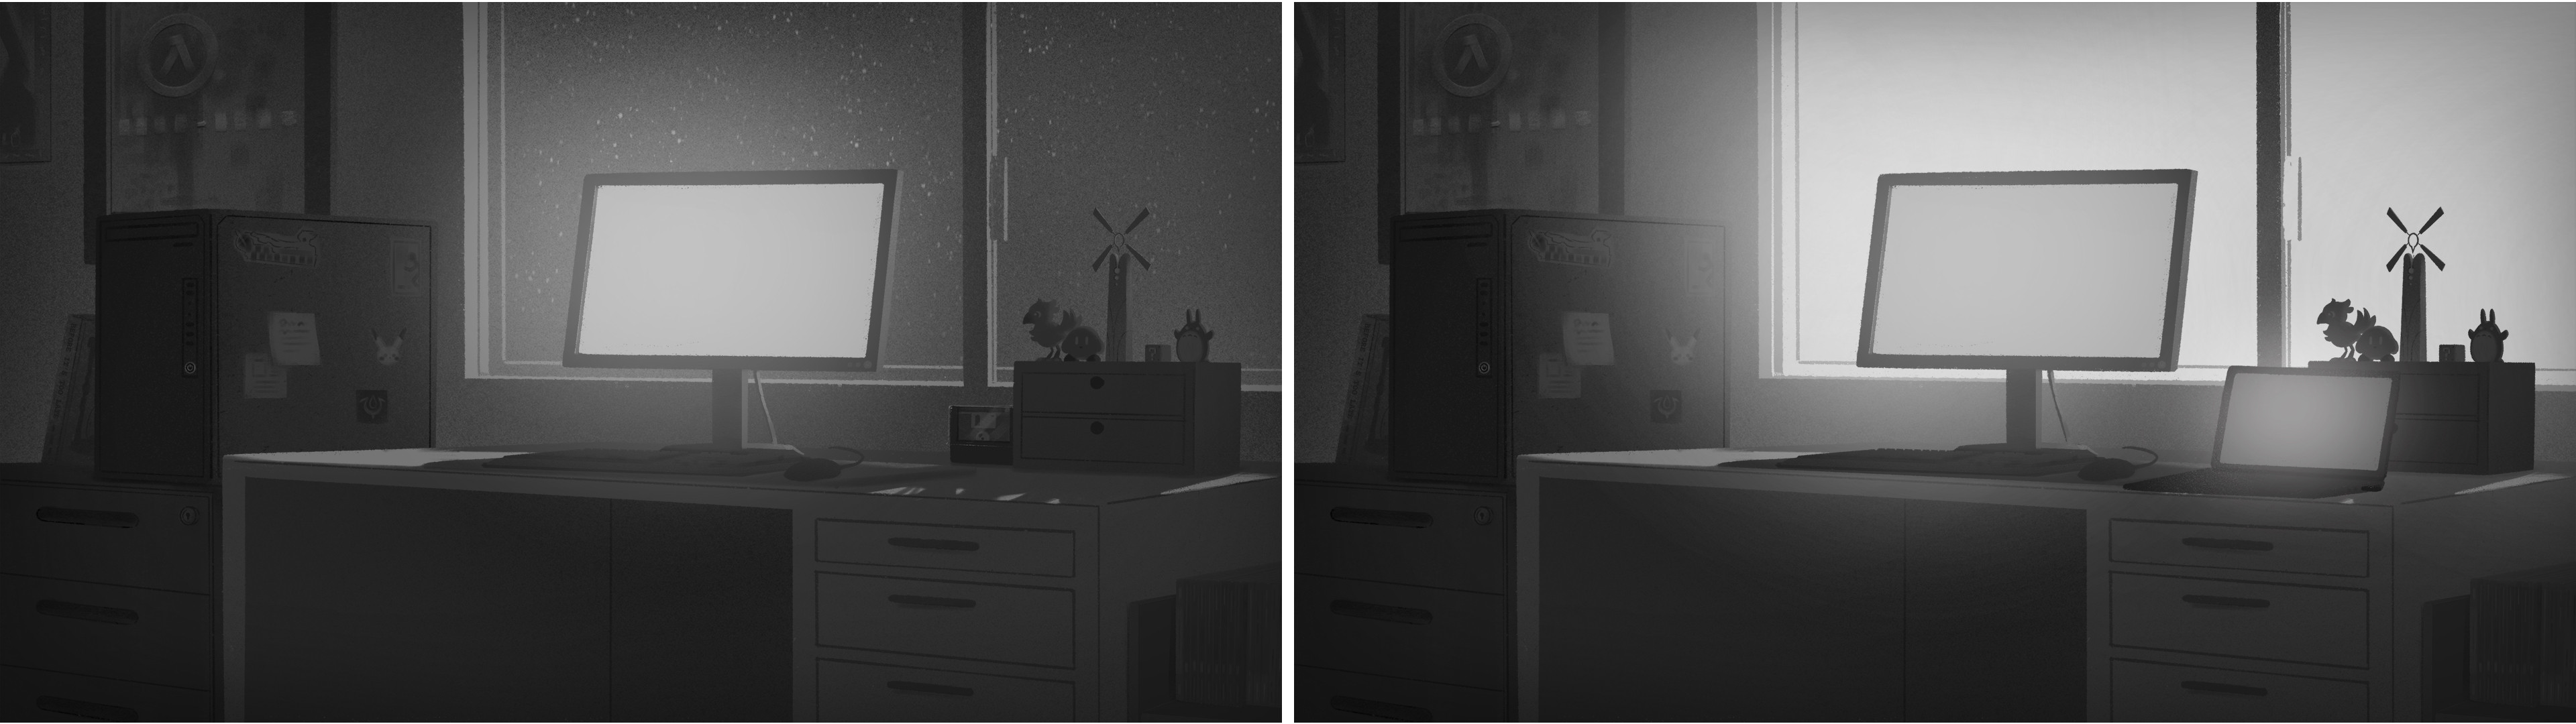 Intro/Outro Cutscene Backgrounds - Night/Day